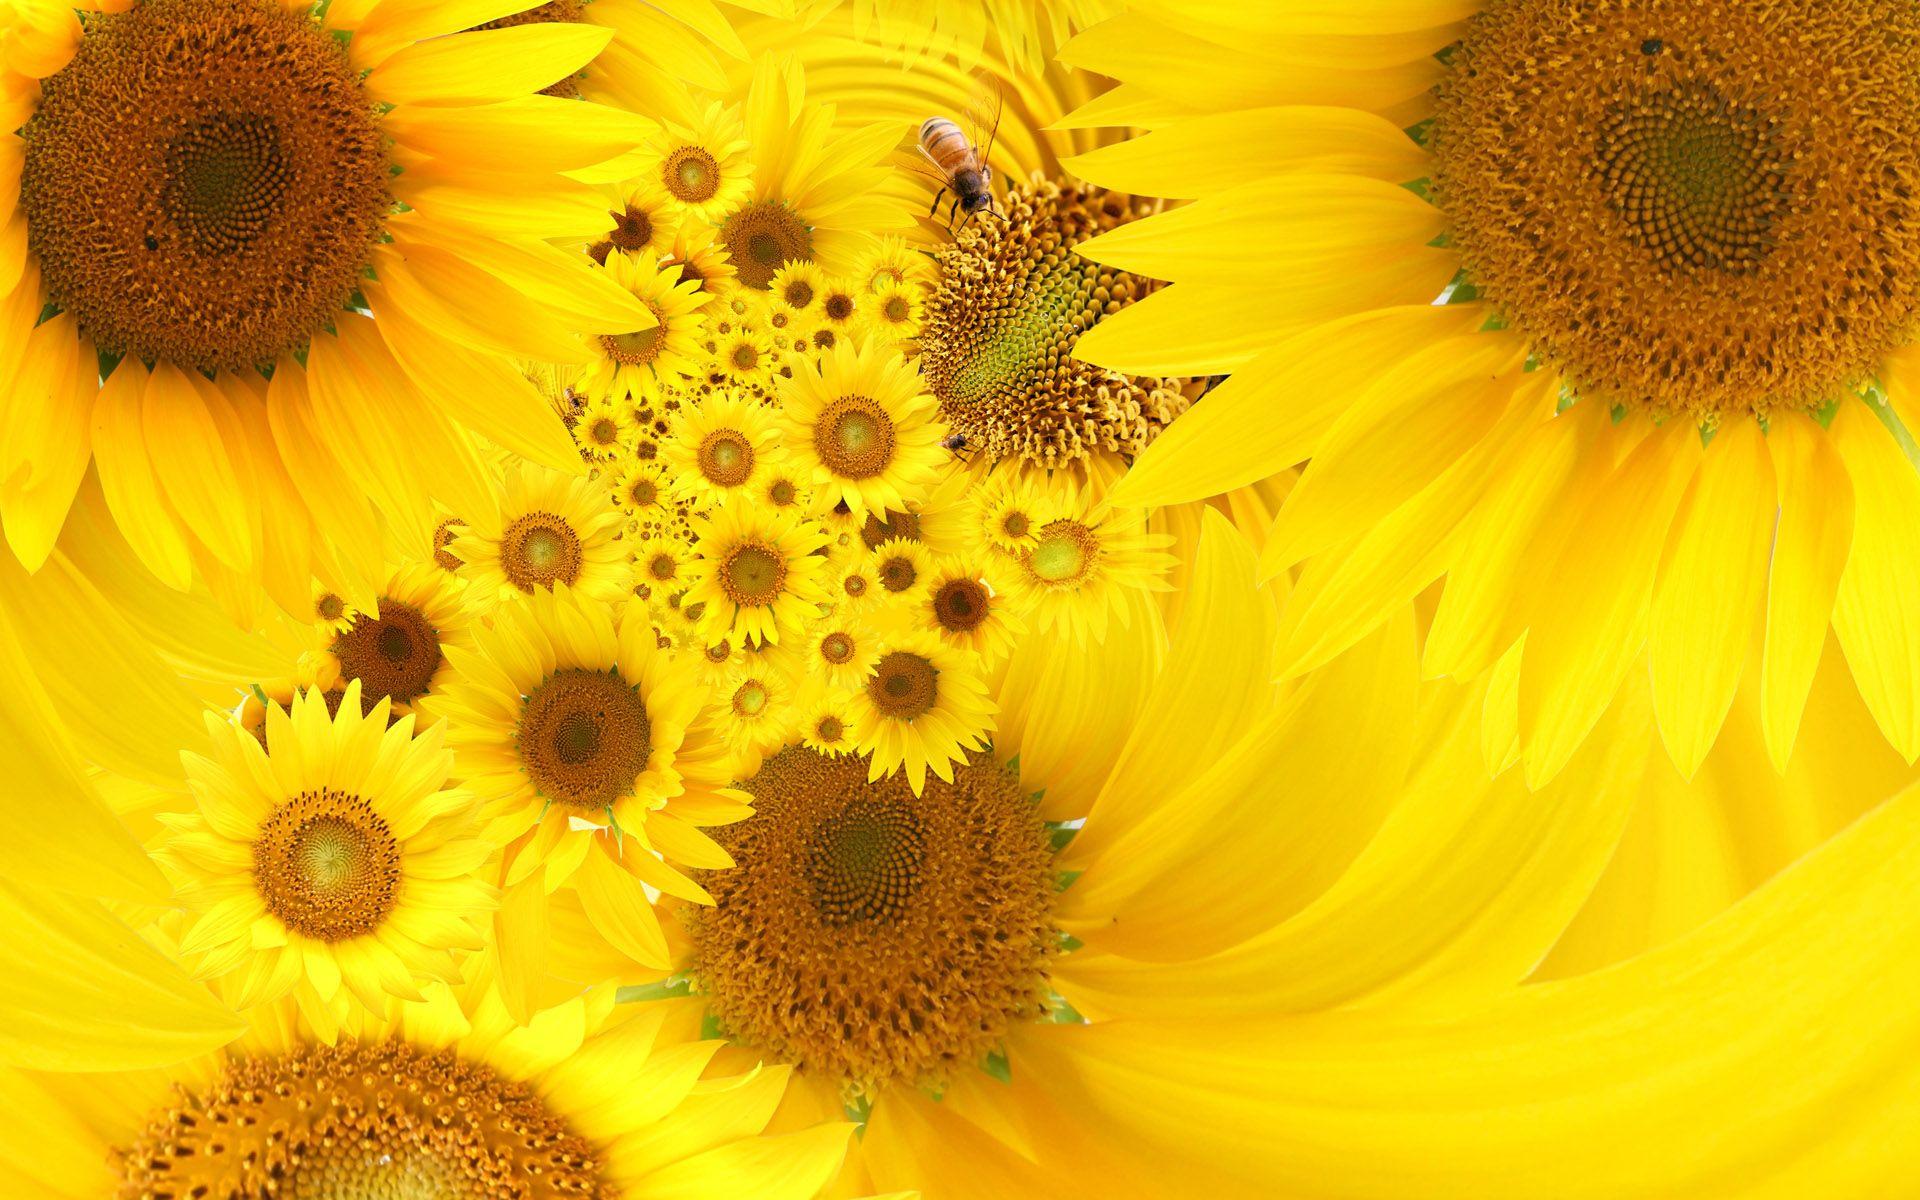 Free Beautiful Yellow Sunflowers computer desktop